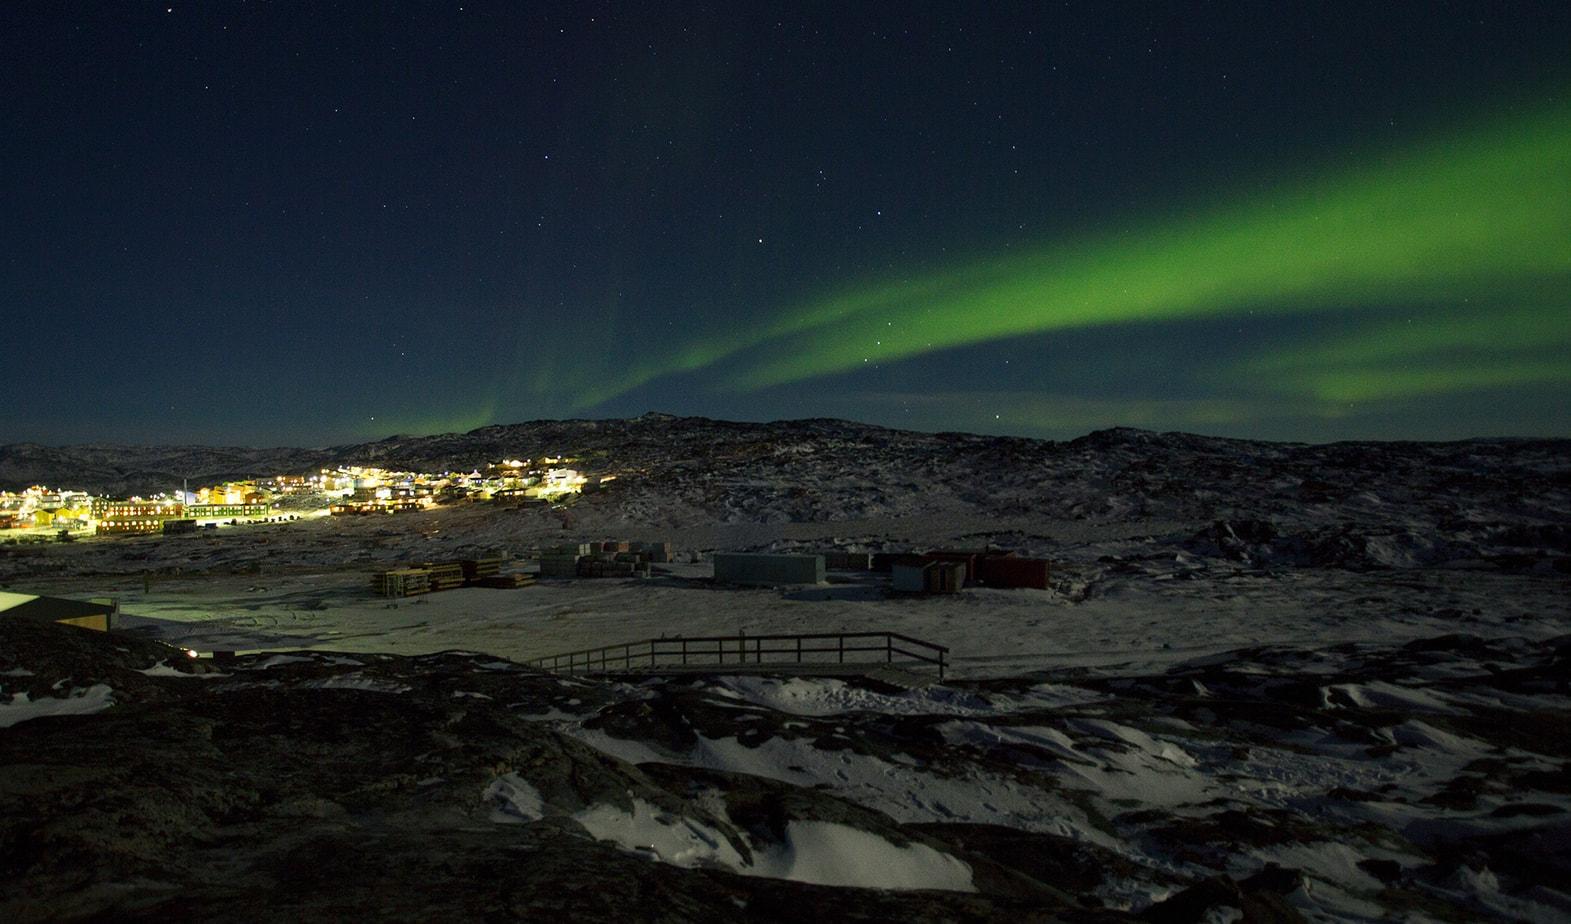 The Color Club - 2016 11 08 Greenland sho7 01 032B